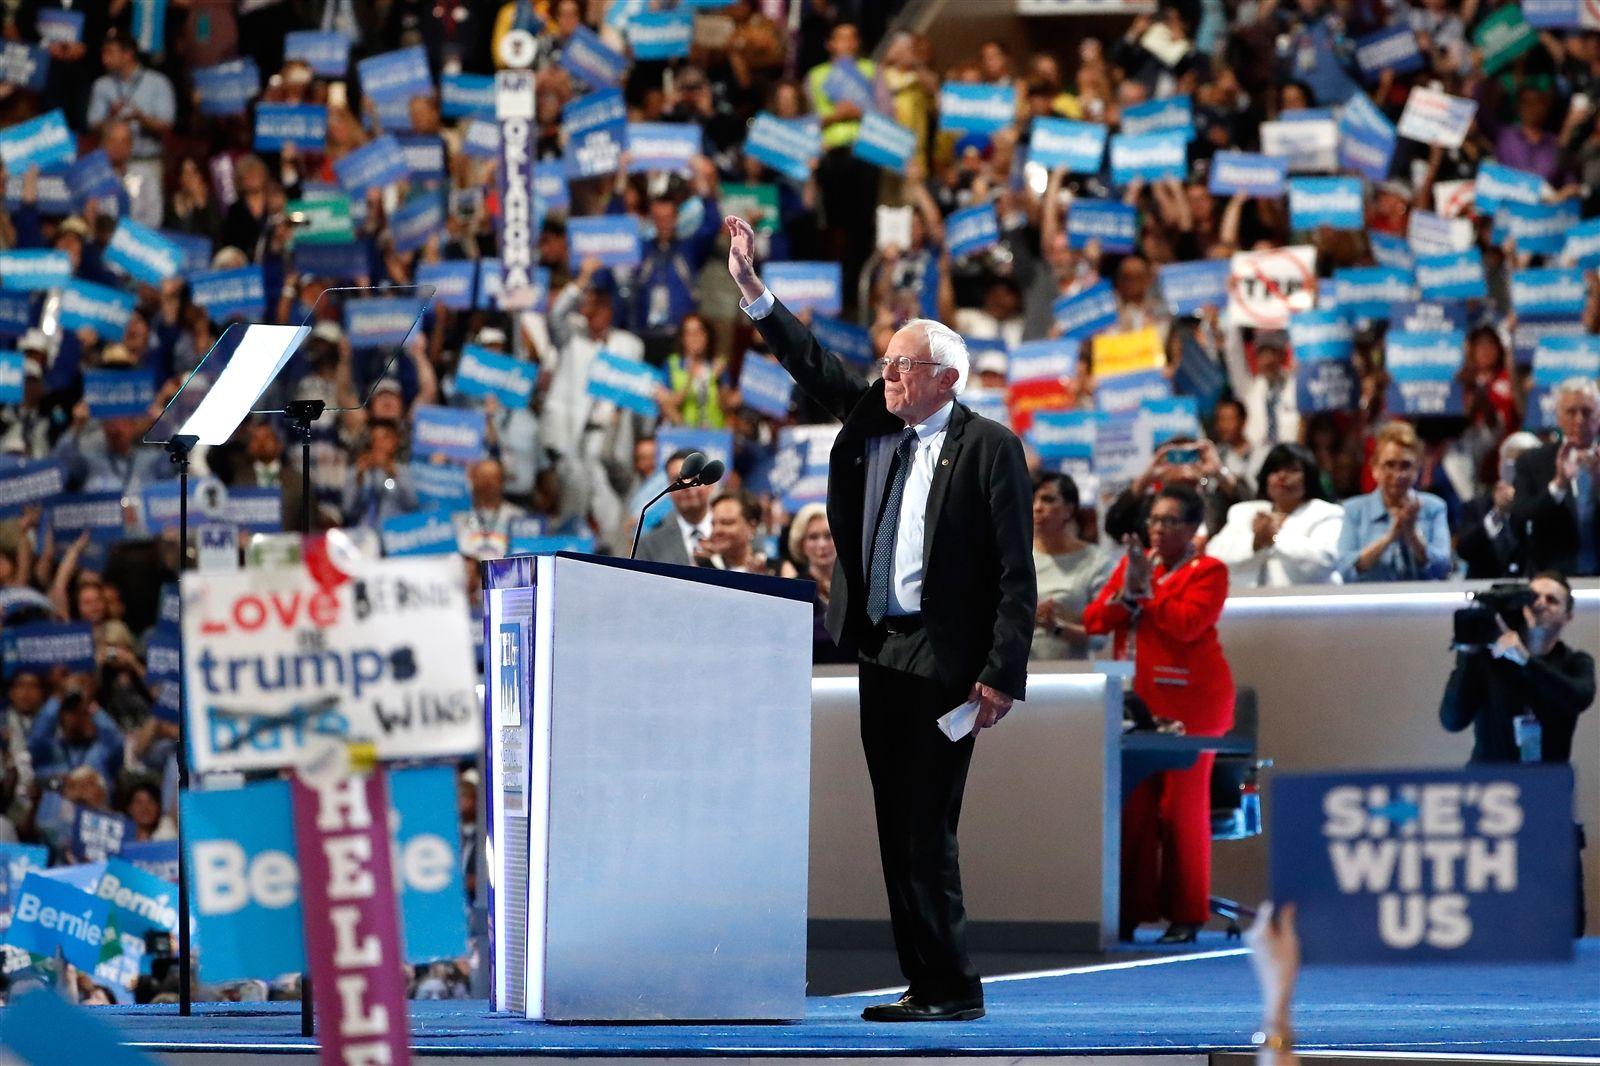 Sen. Bernie Sanders delivers remarks.